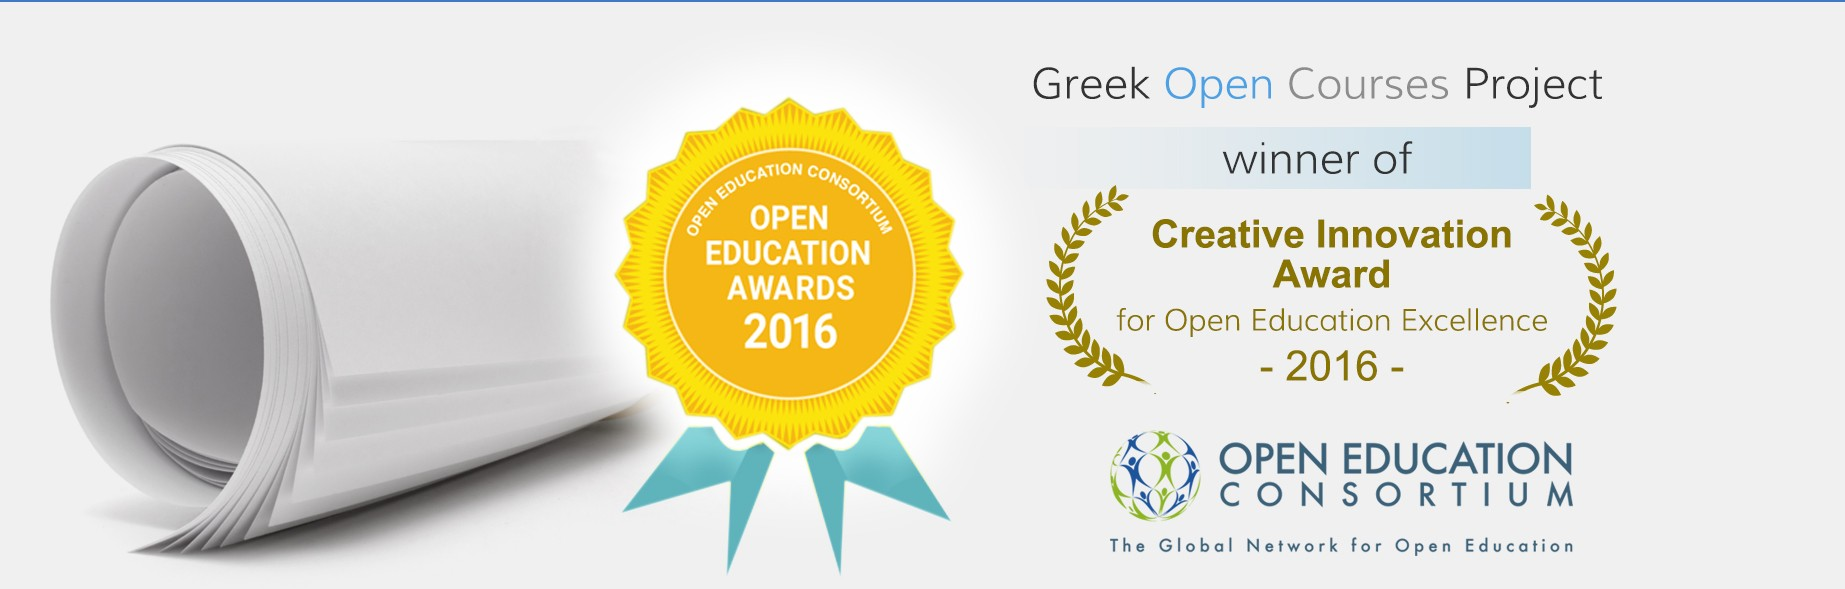 Greek Academic Network - GUnet a3bbd4a86b2